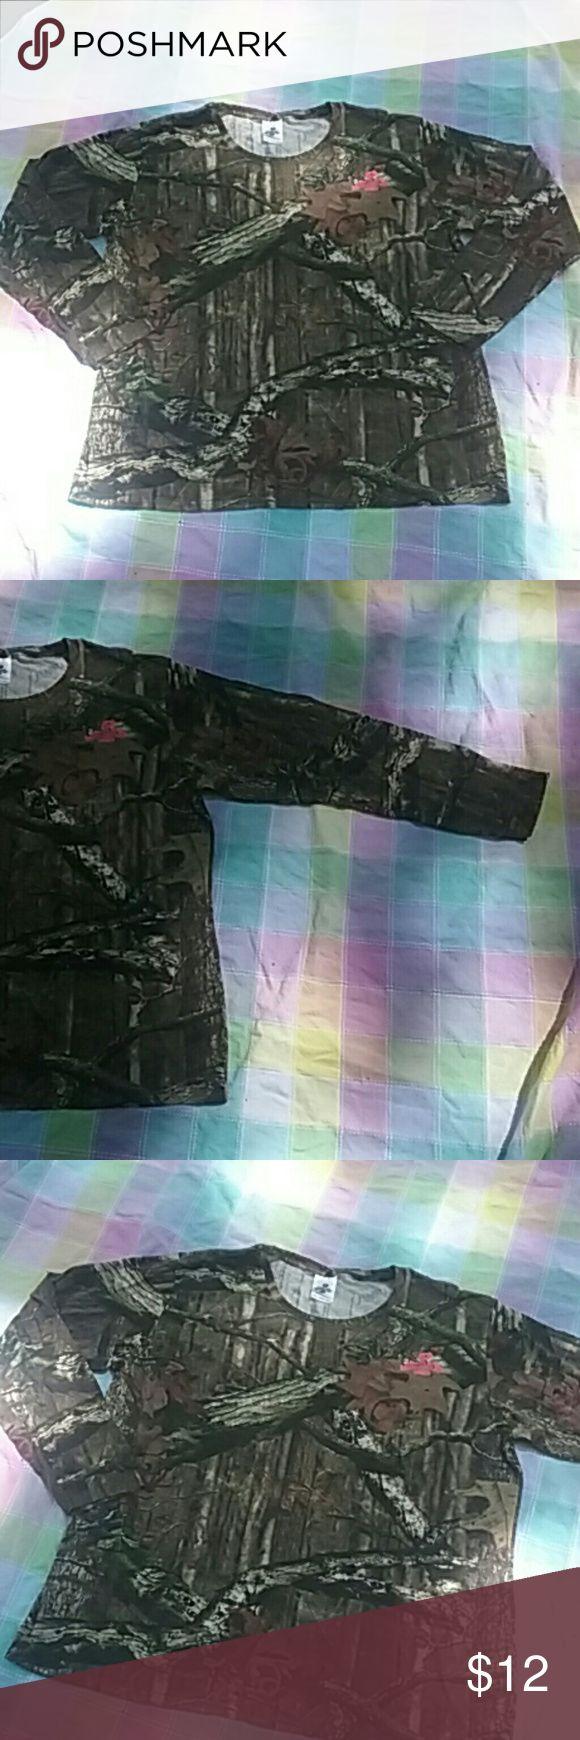 Women's Mossy Oak Long Sleeved Camo Shirt 2XL Camo long sleeved shirt by Mossy Oak. 2XL Mossy Oak Tops Tees - Long Sleeve